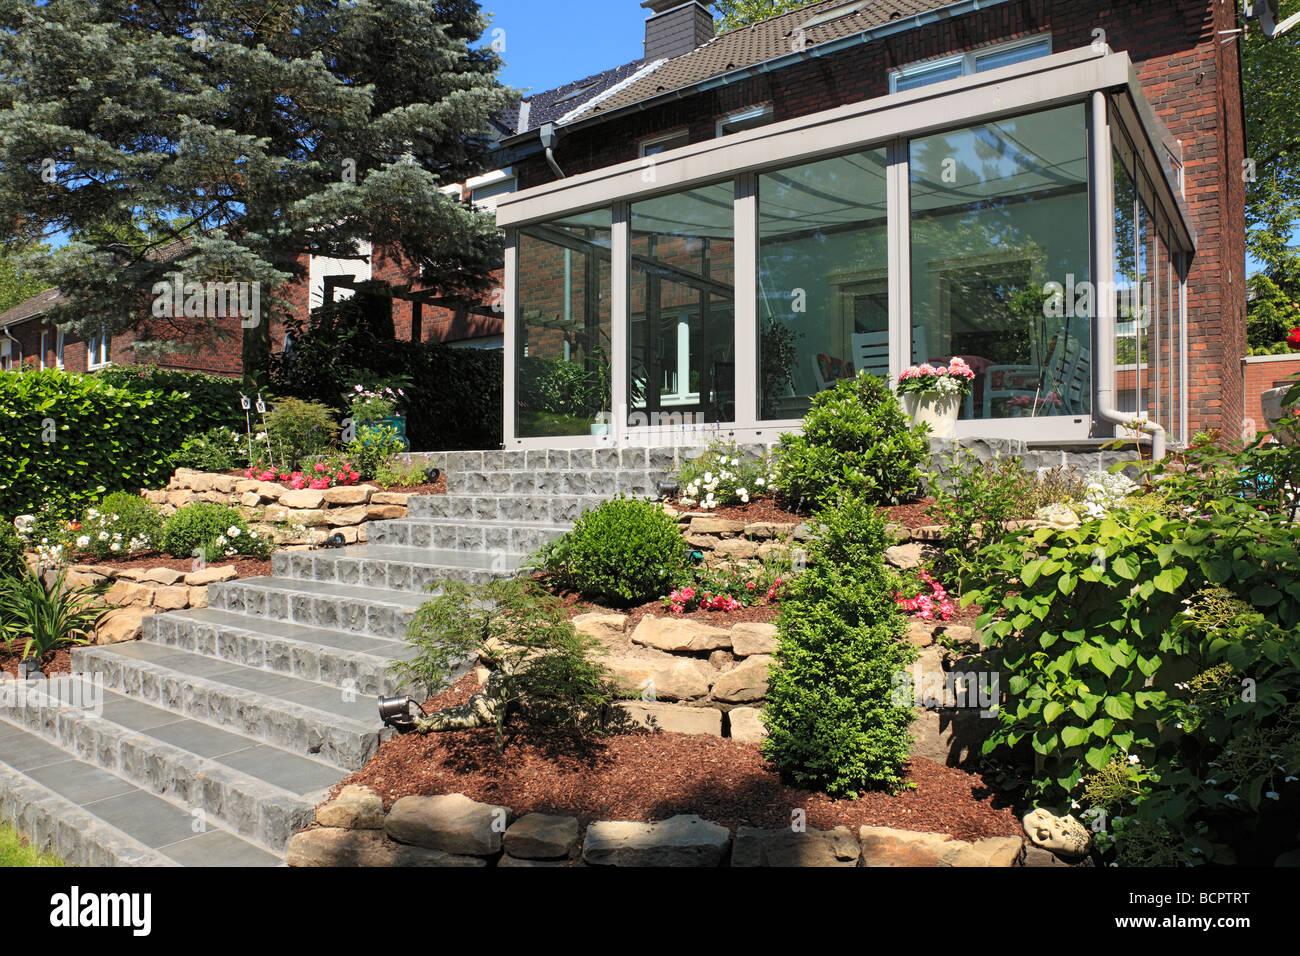 Giardino Dinverno In Casa : Giardino dinverno e casa residenziale casa fila lato giardino